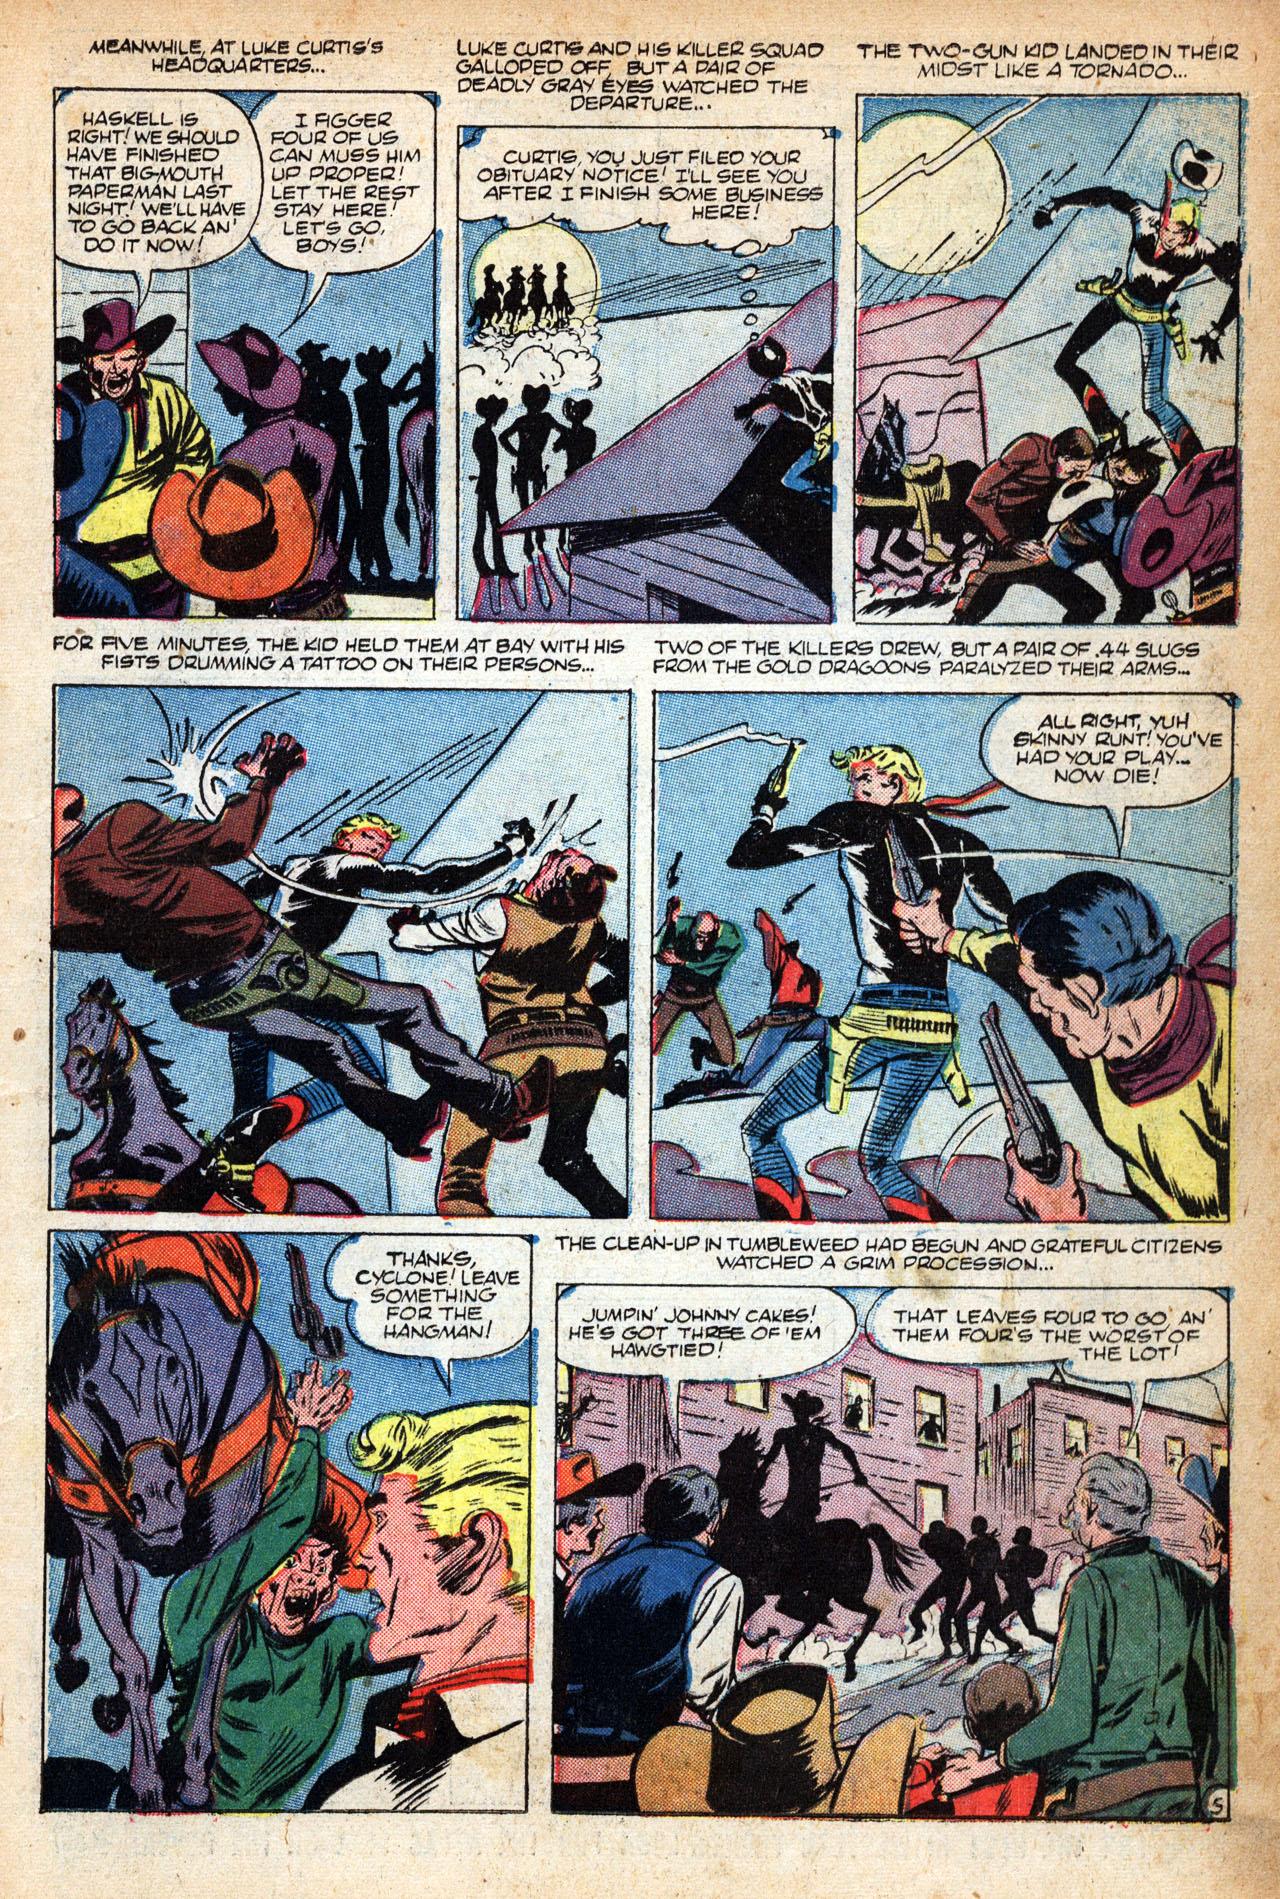 Read online Two-Gun Kid comic -  Issue #18 - 15